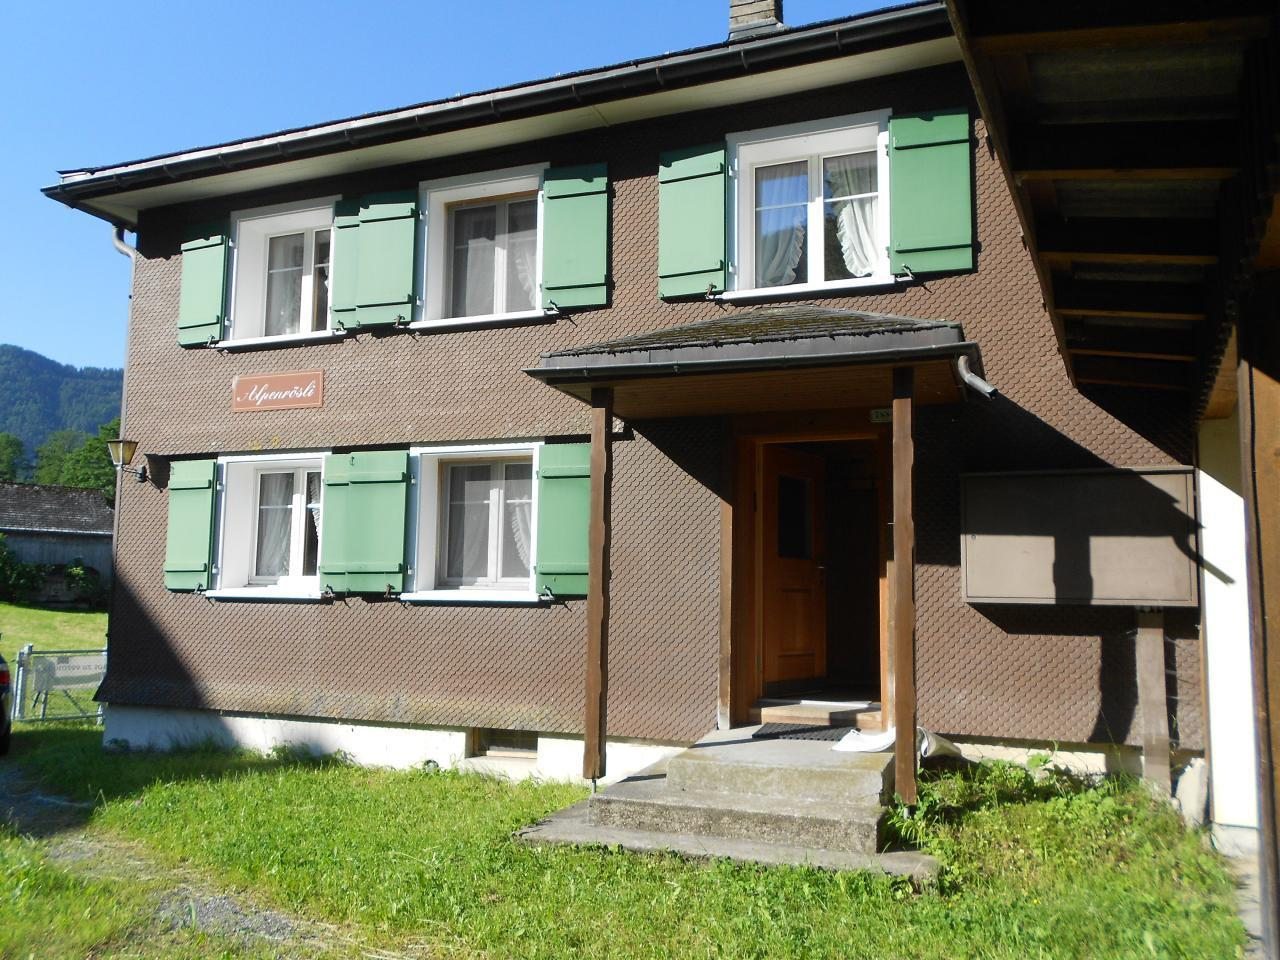 Maison de vacances Alpenrösli in Nesslau (2640830), Nesslau, Toggenbourg, Suisse Orientale, Suisse, image 9